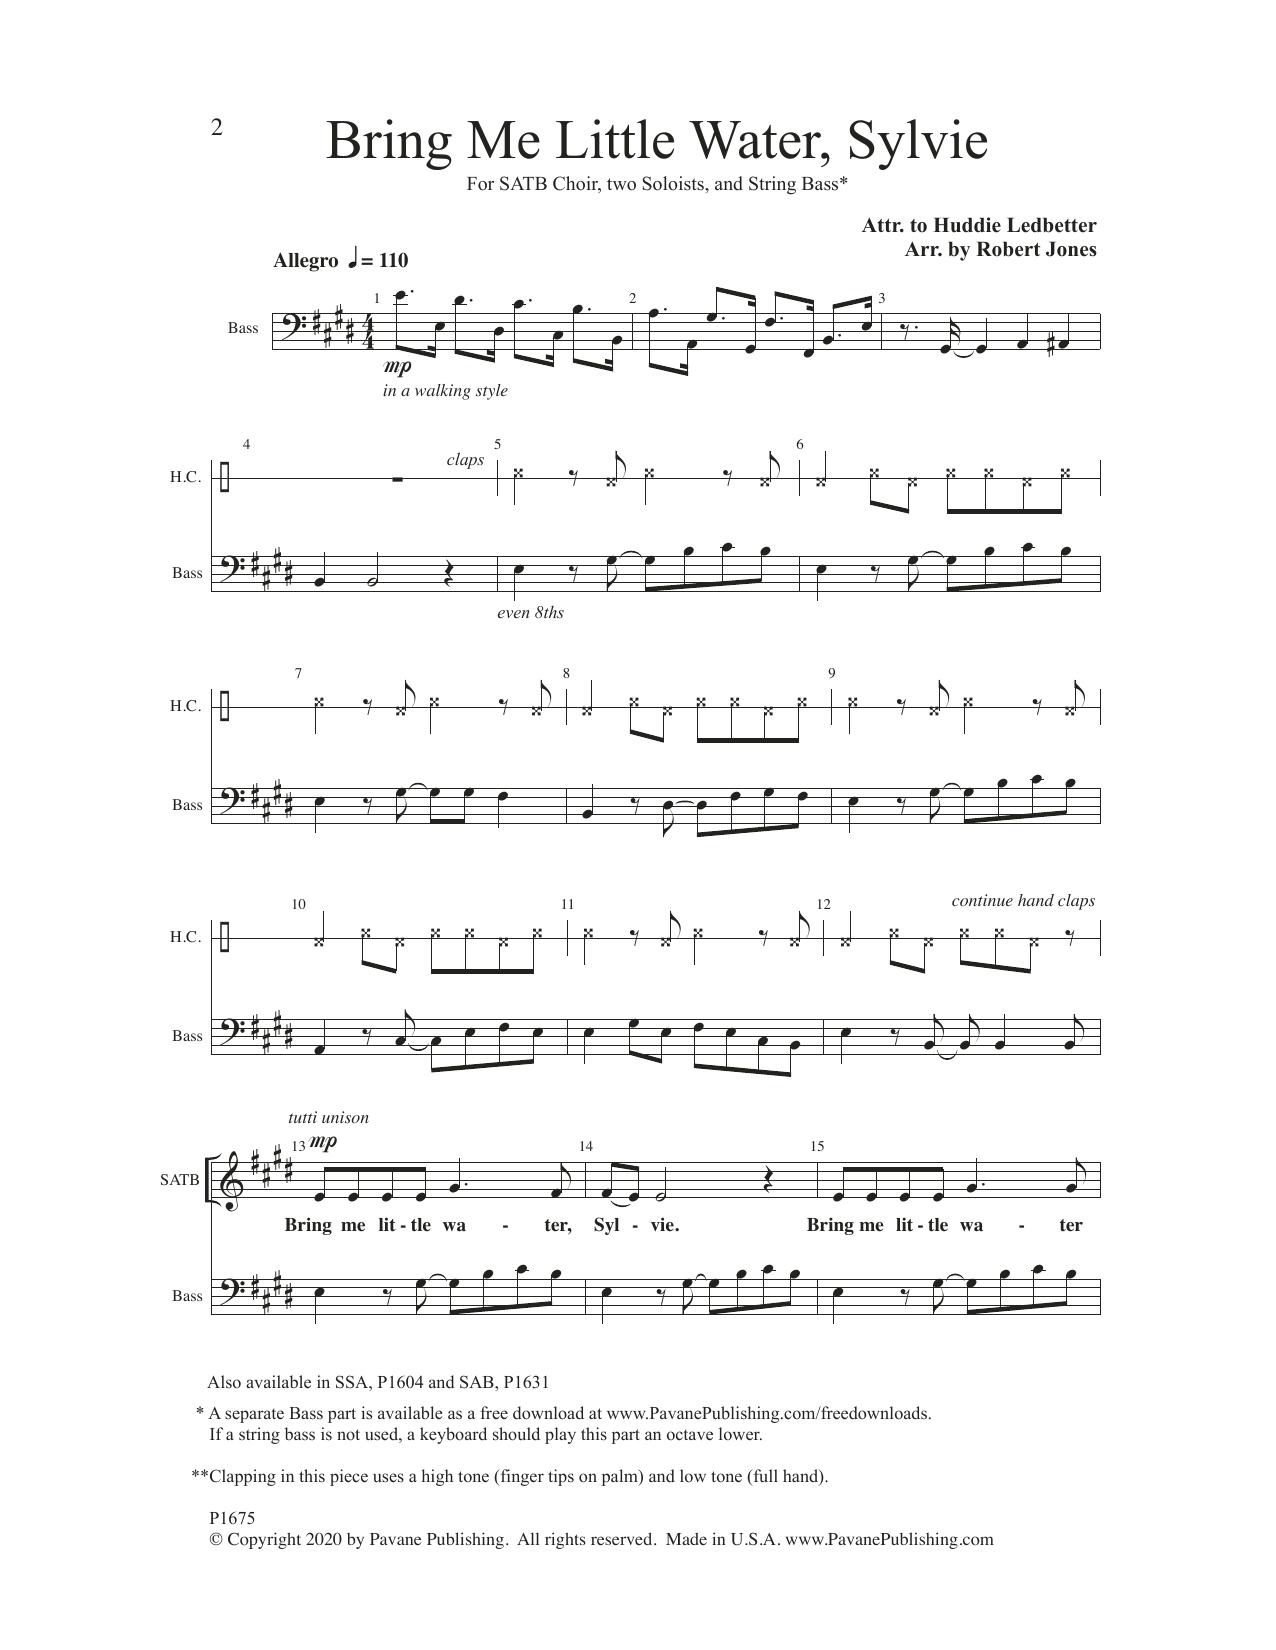 Bring Me little Water, Sylvie Sheet Music